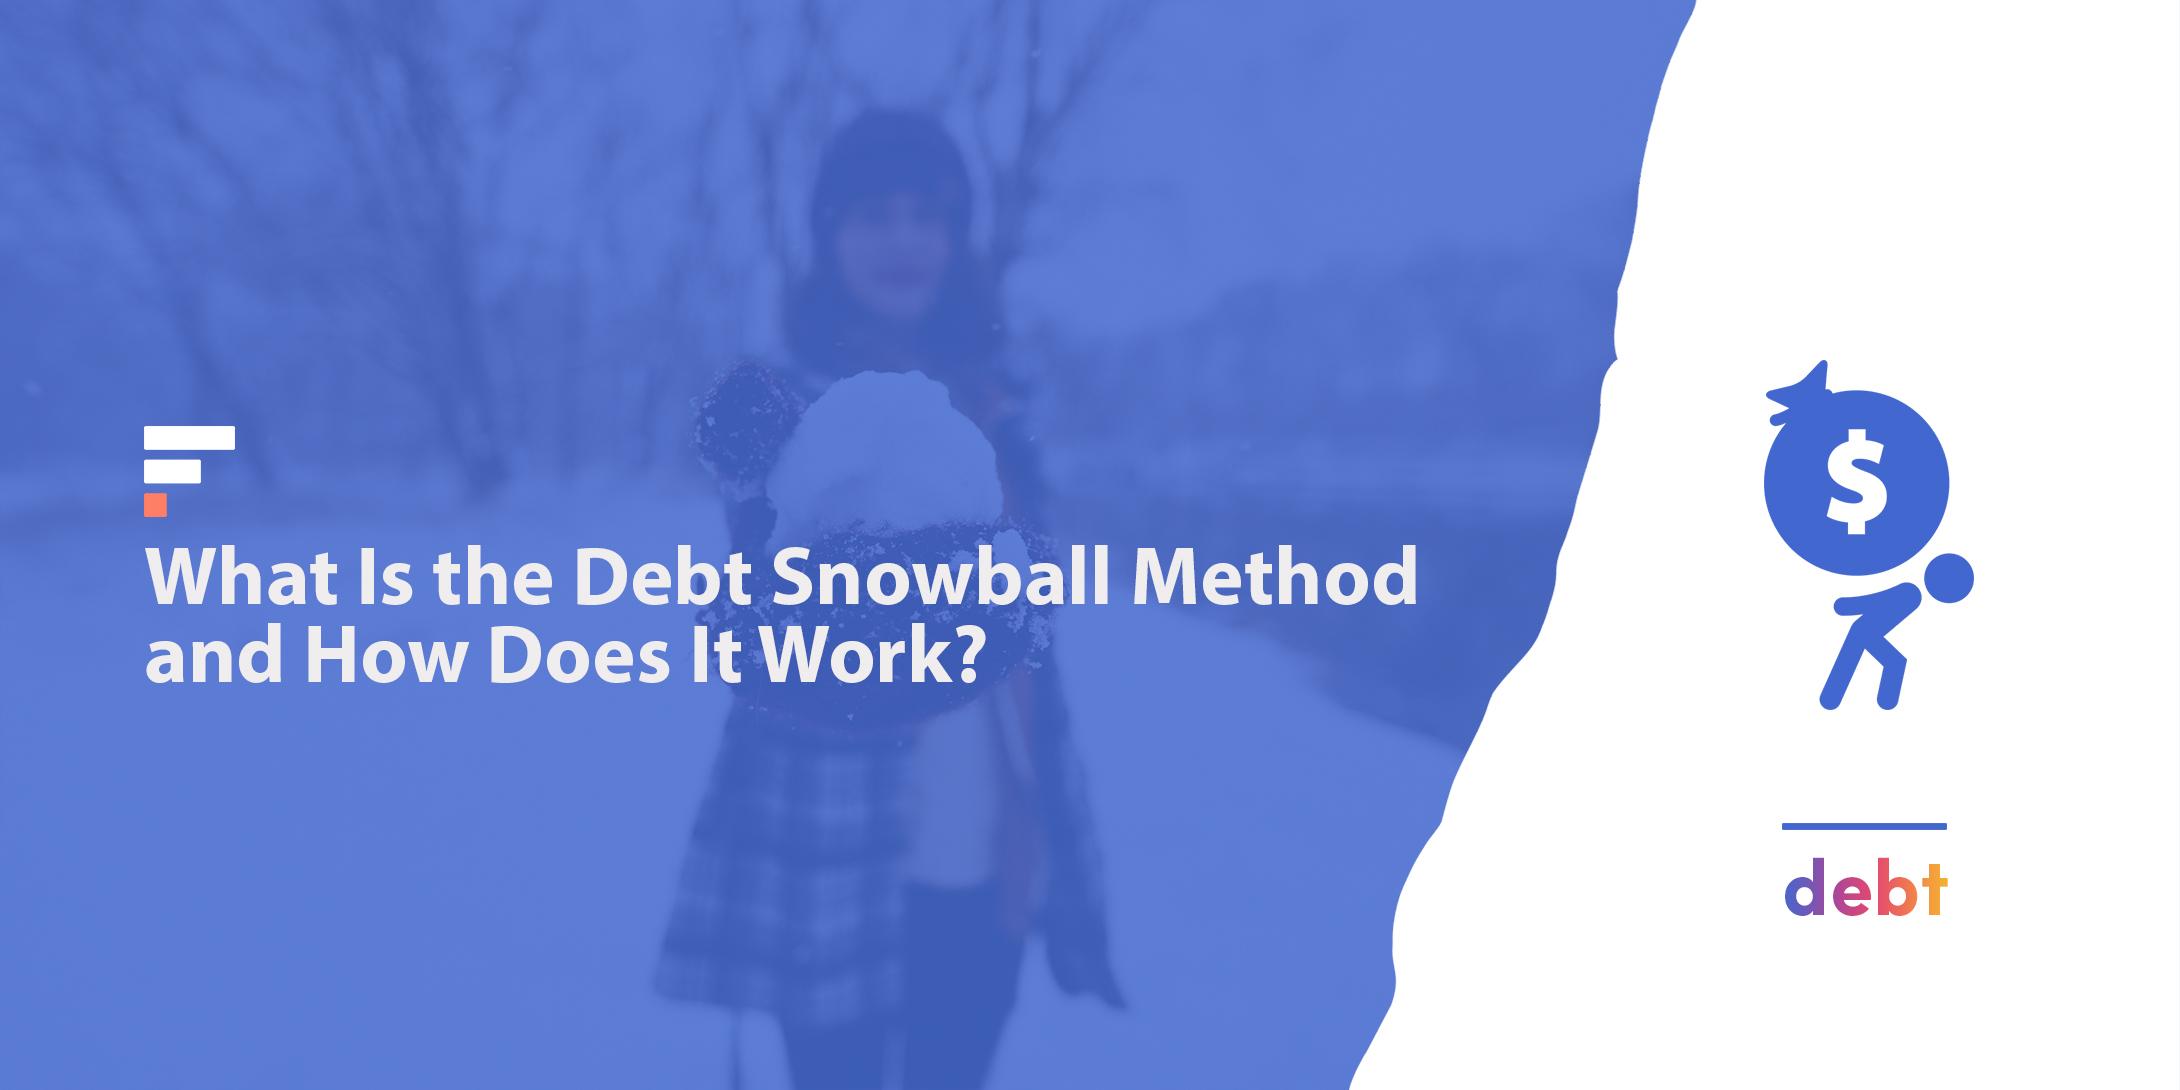 Debt snowball method